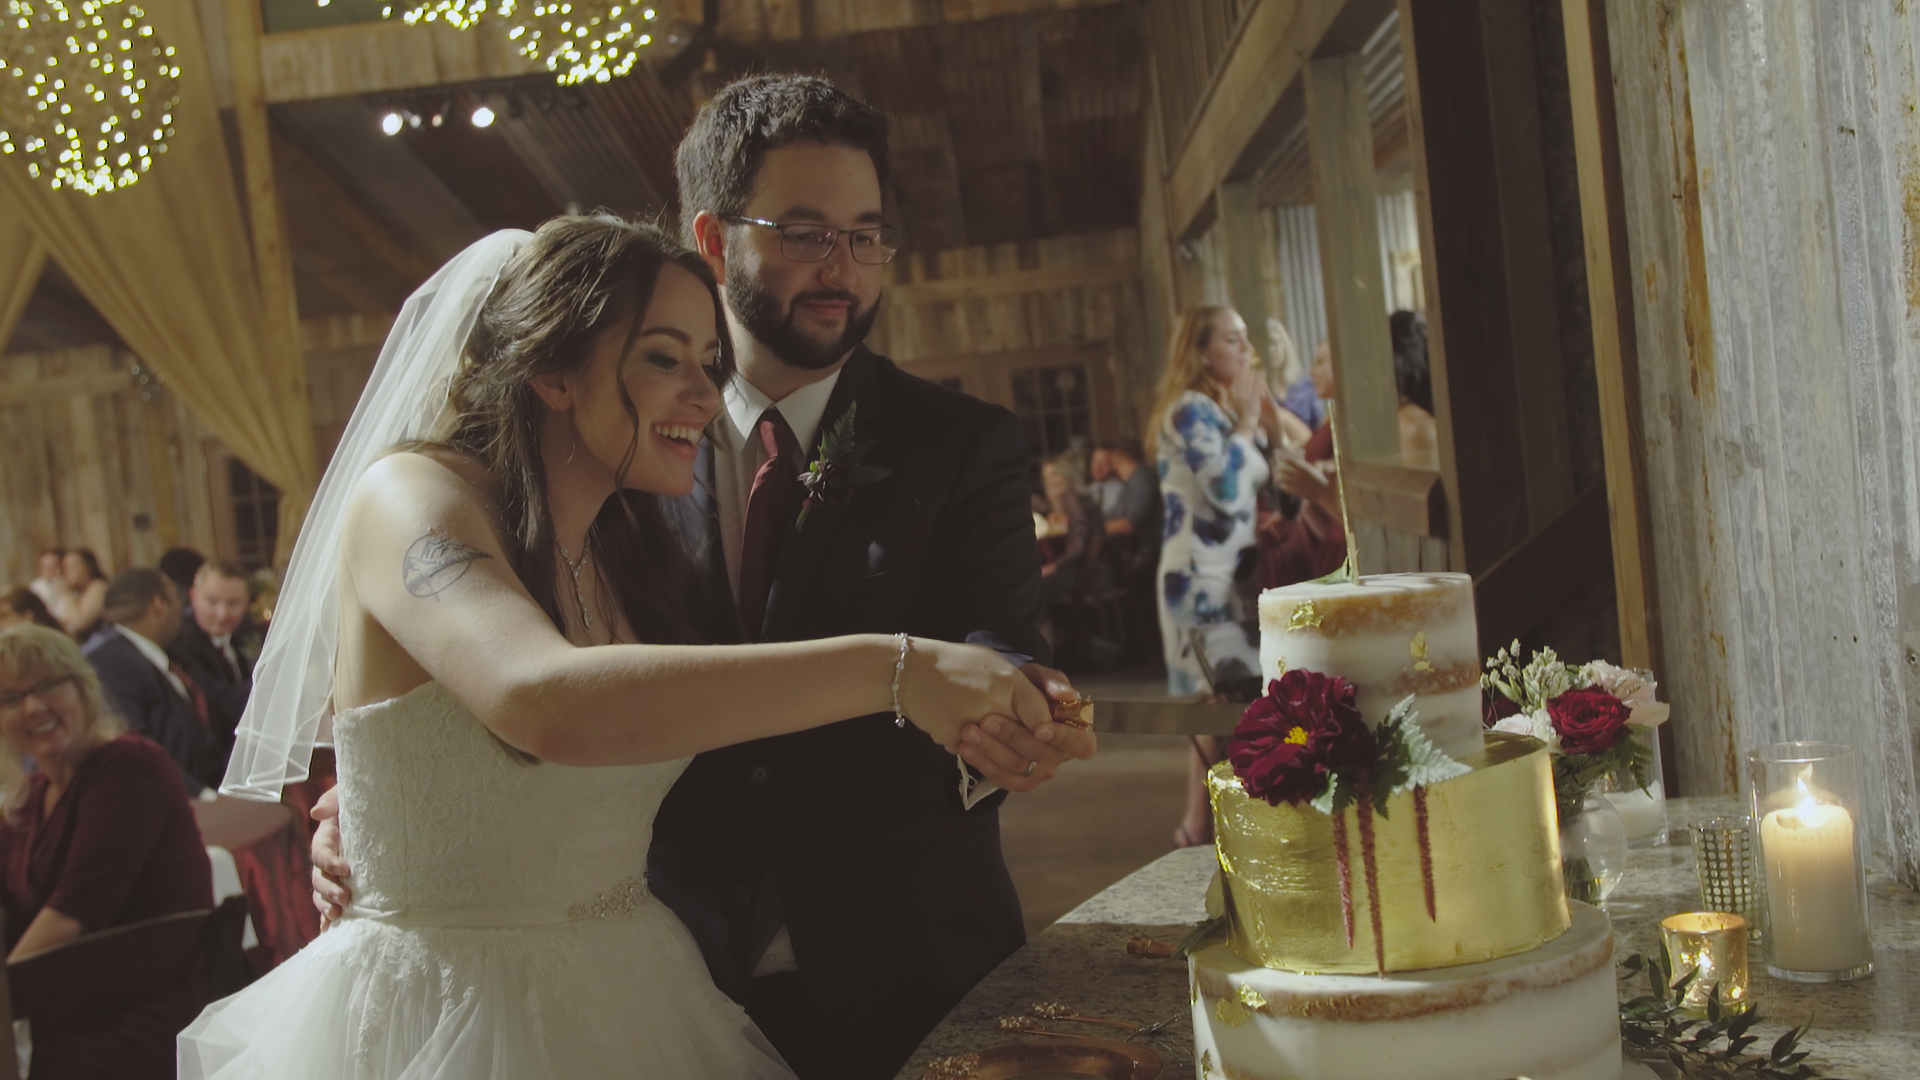 Rebecca_and_Daniel_Wedding_Austin_Texas_Vista_West_Ranch21.png